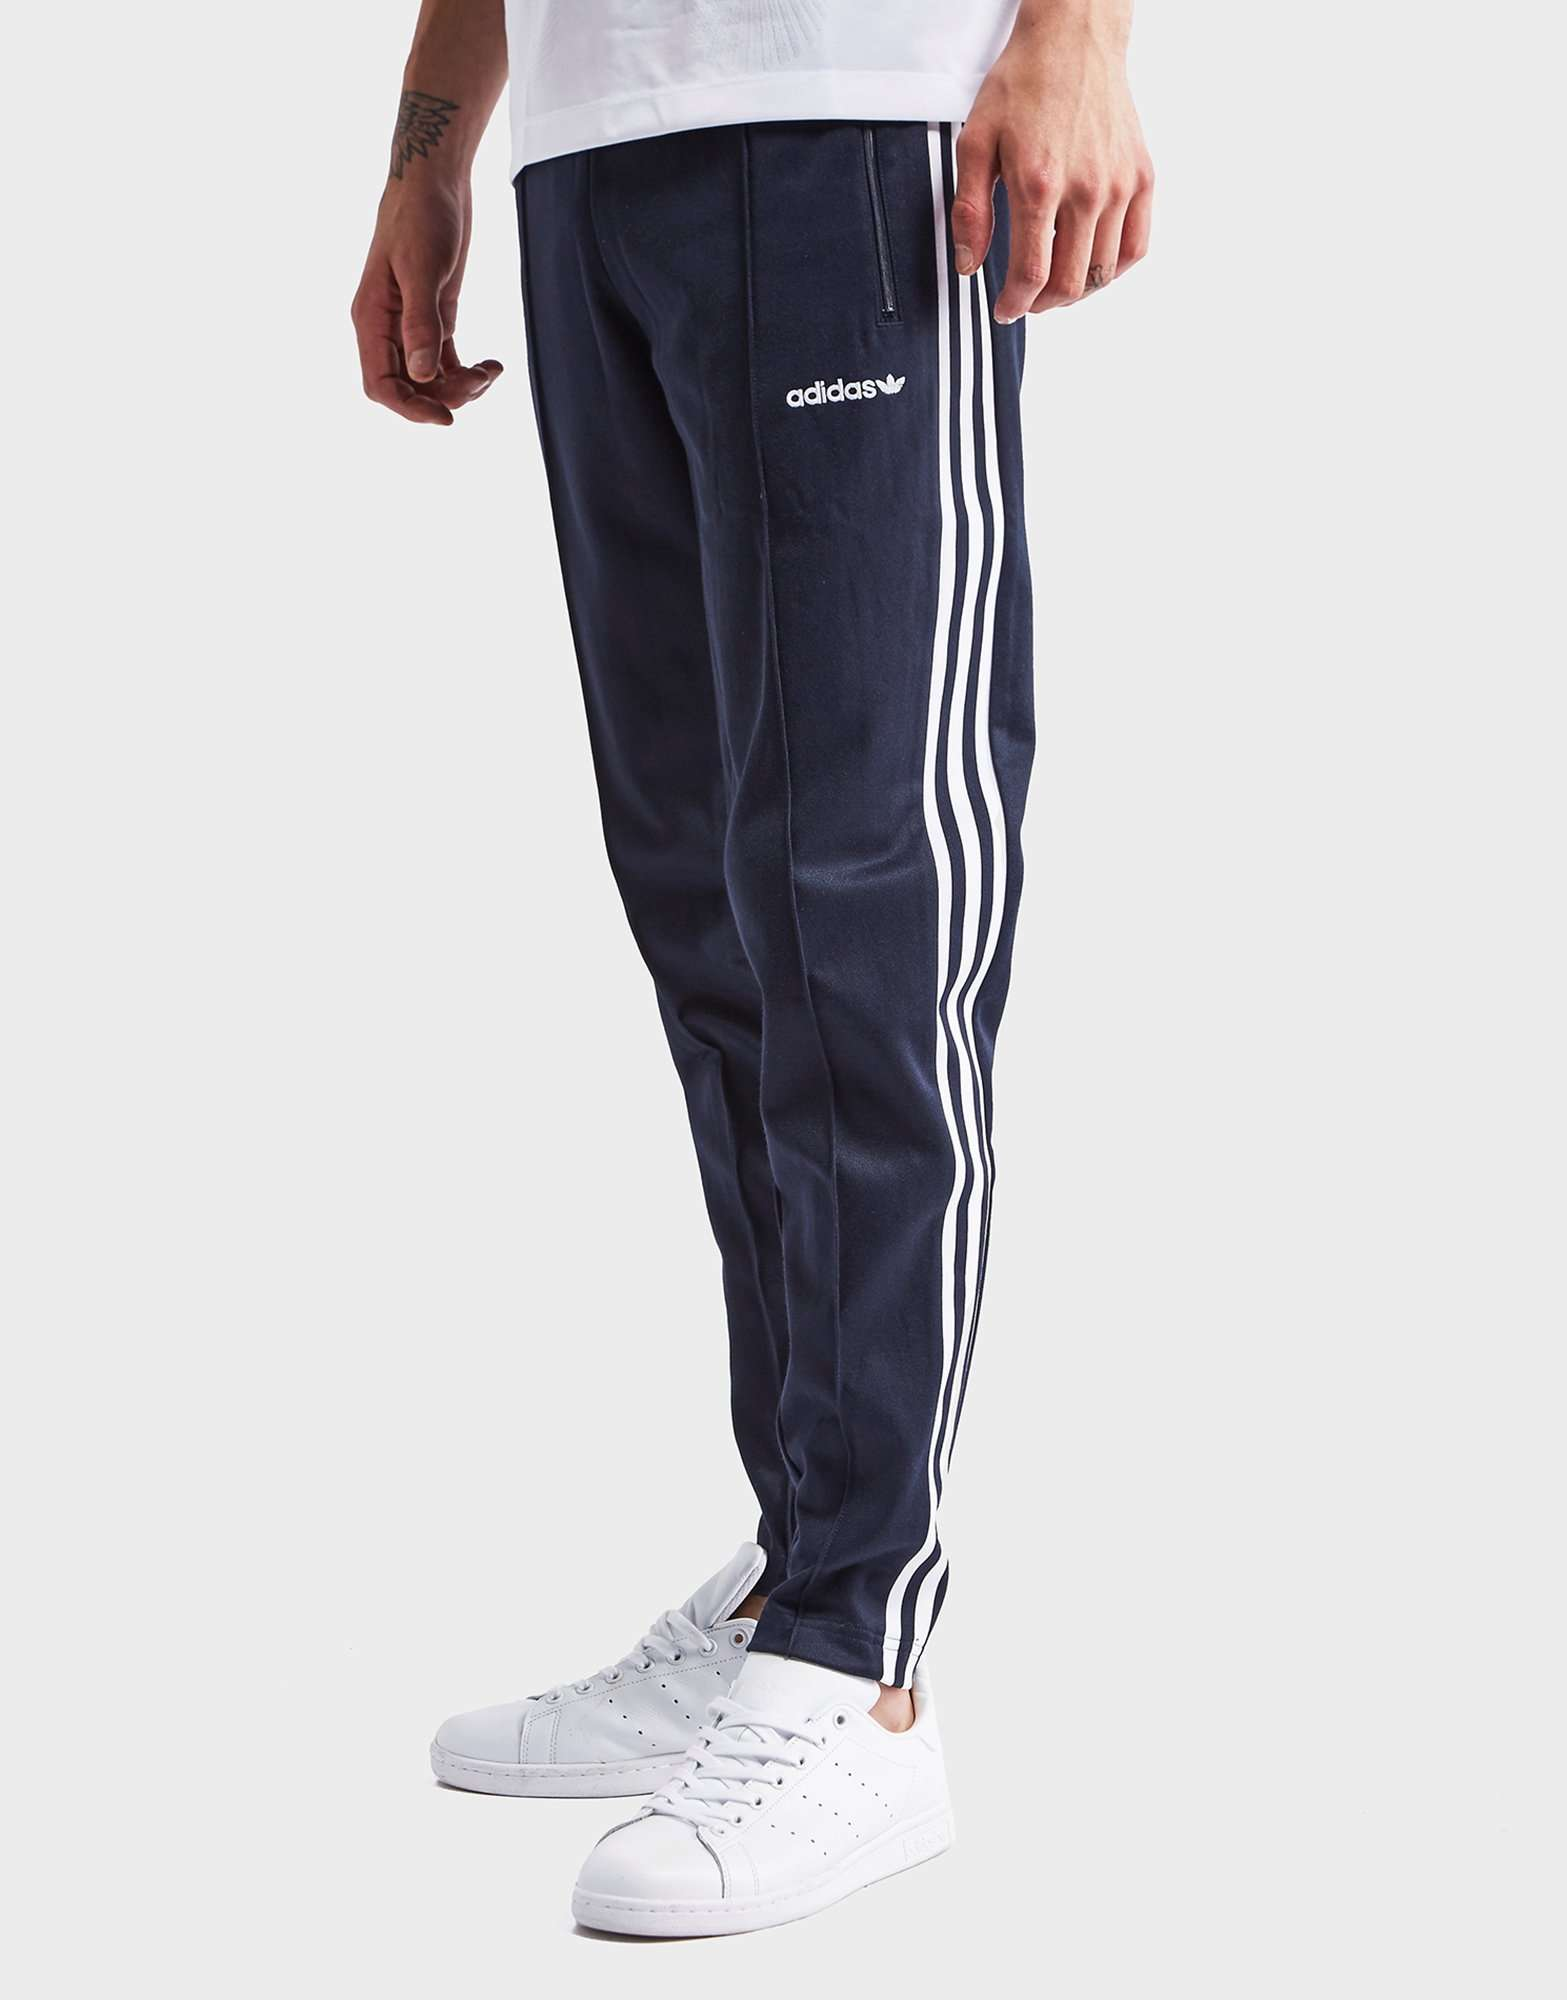 adidas Originals Beckenbauer Cuffed Track Pants  2503a5889